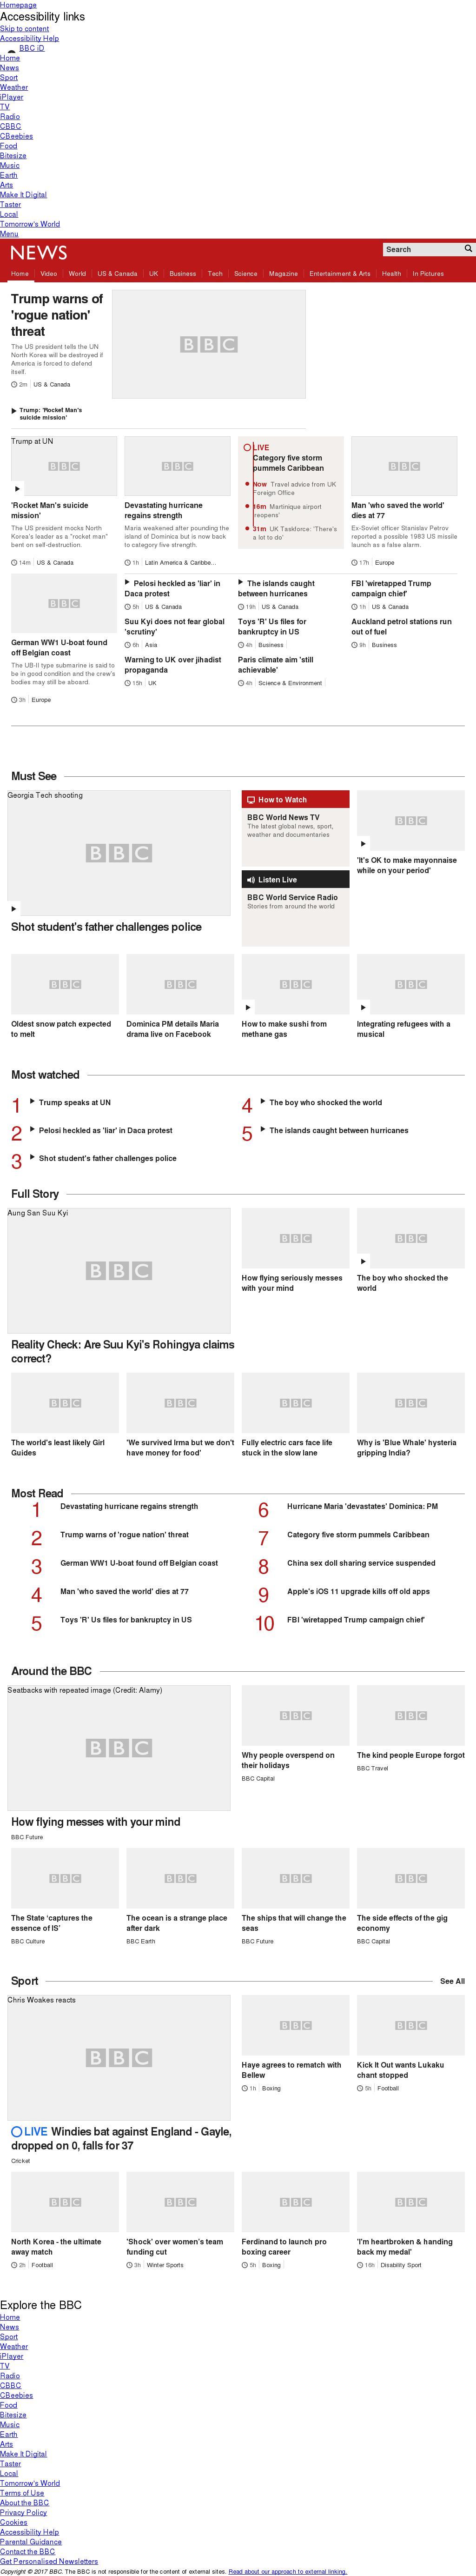 BBC at Tuesday Sept. 19, 2017, 3:01 p.m. UTC